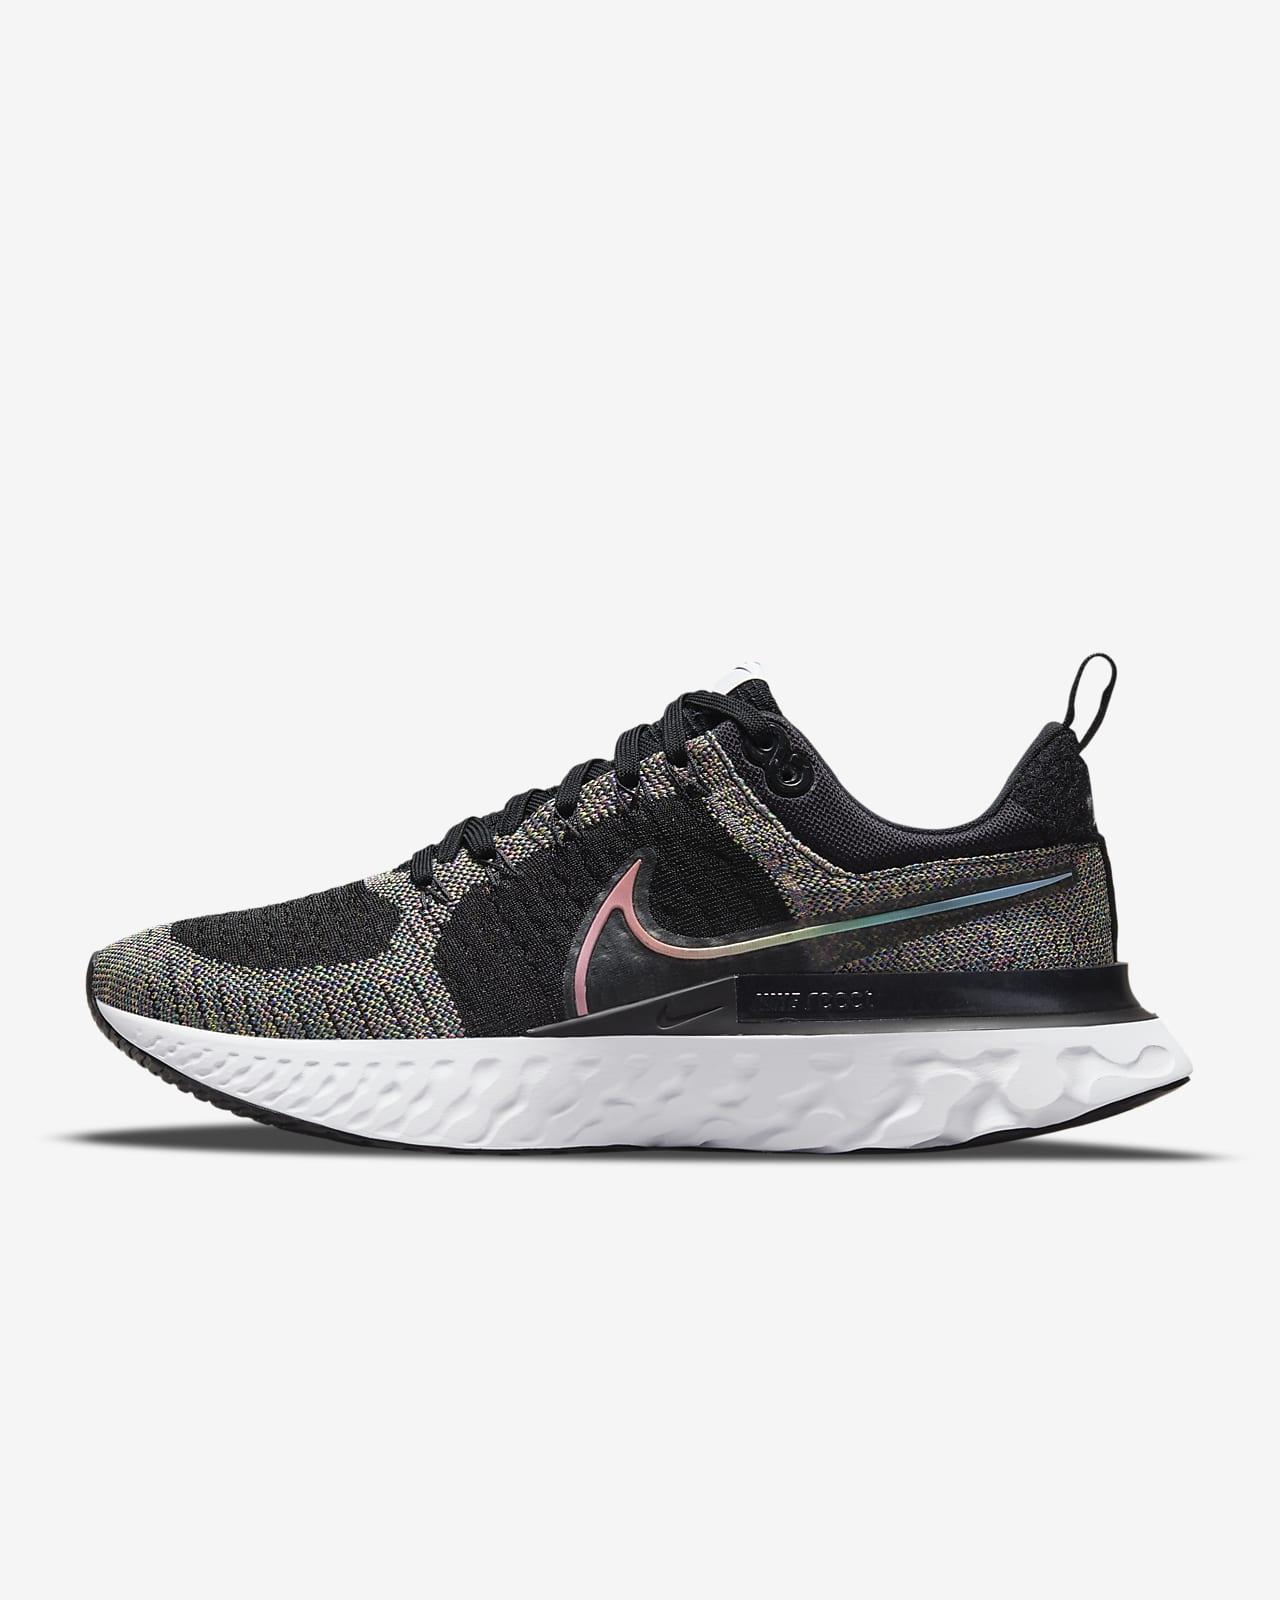 Calzado Nike React Infinity Run FK 2 BeTrue